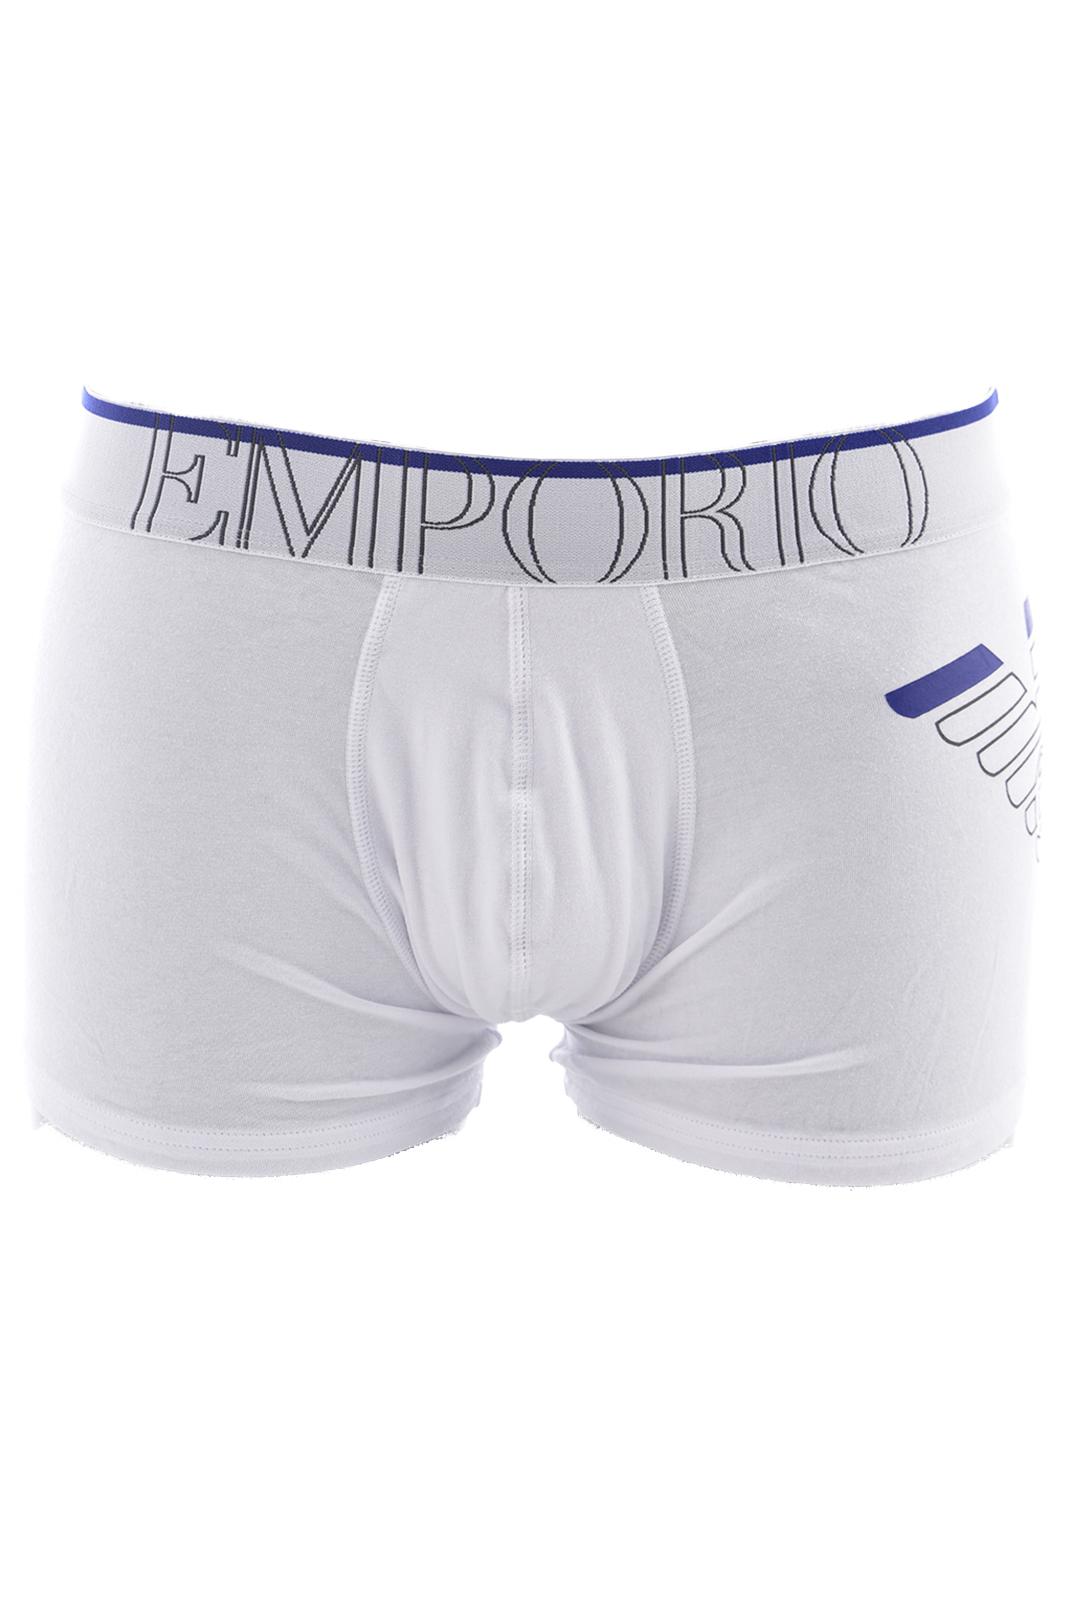 Slips-Caleçons  Emporio armani 111776 8A725 00010 BIANCO